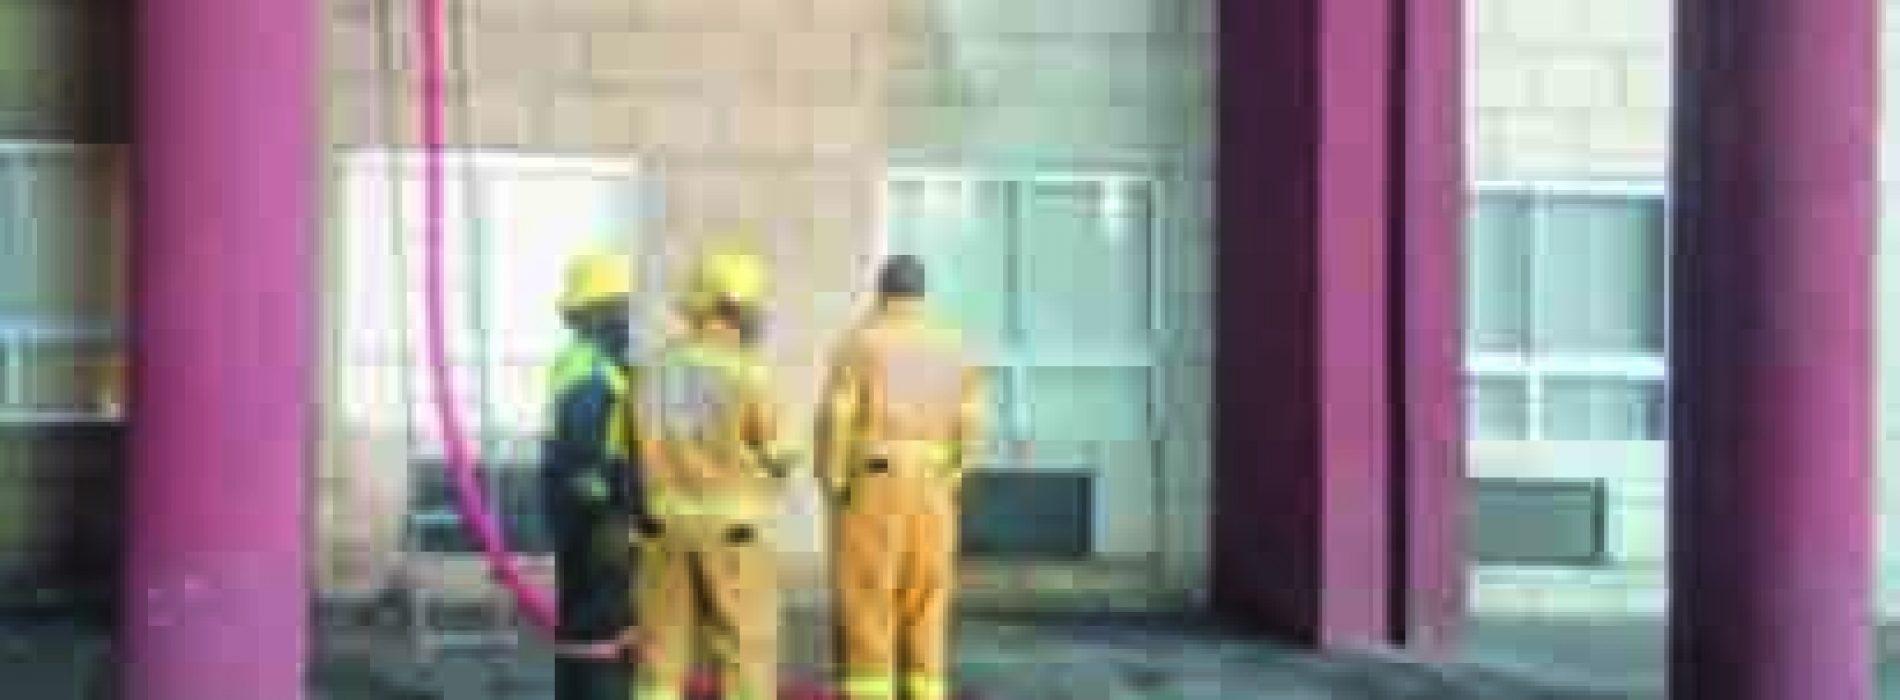 Fire guts health office